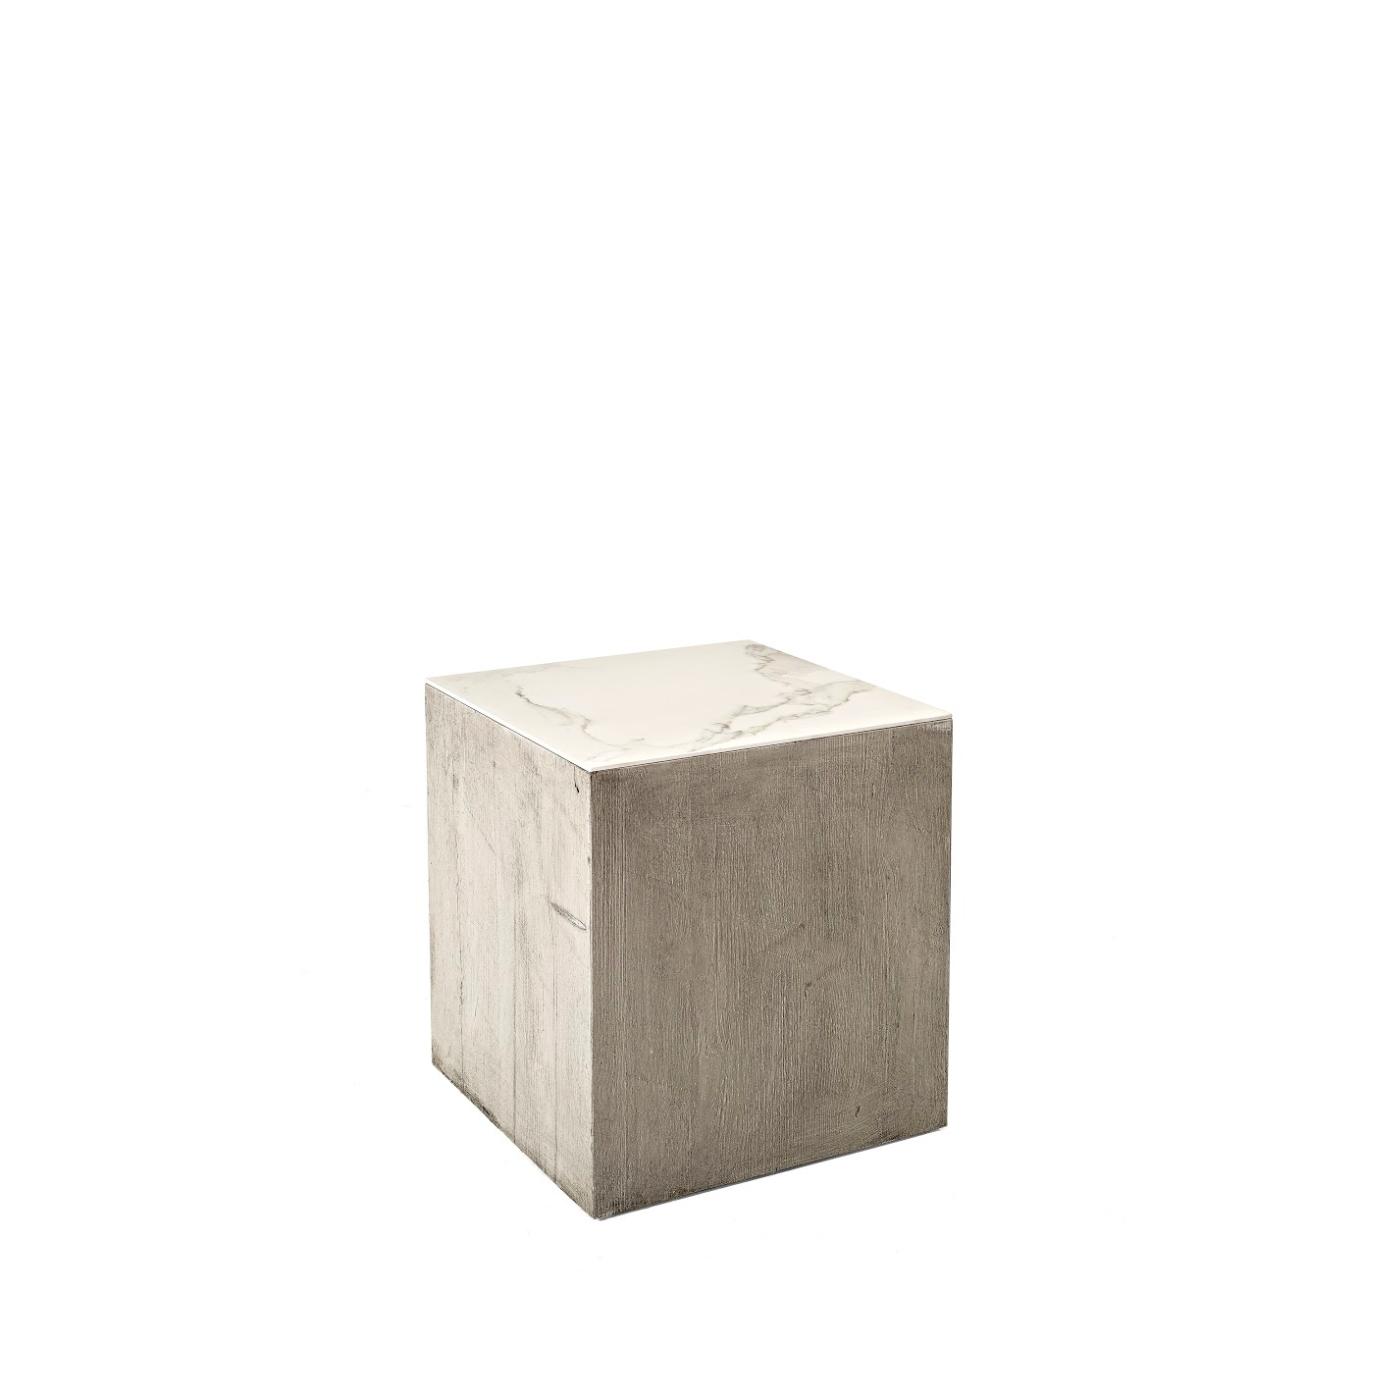 Cube on Castors (Code 7583) Image